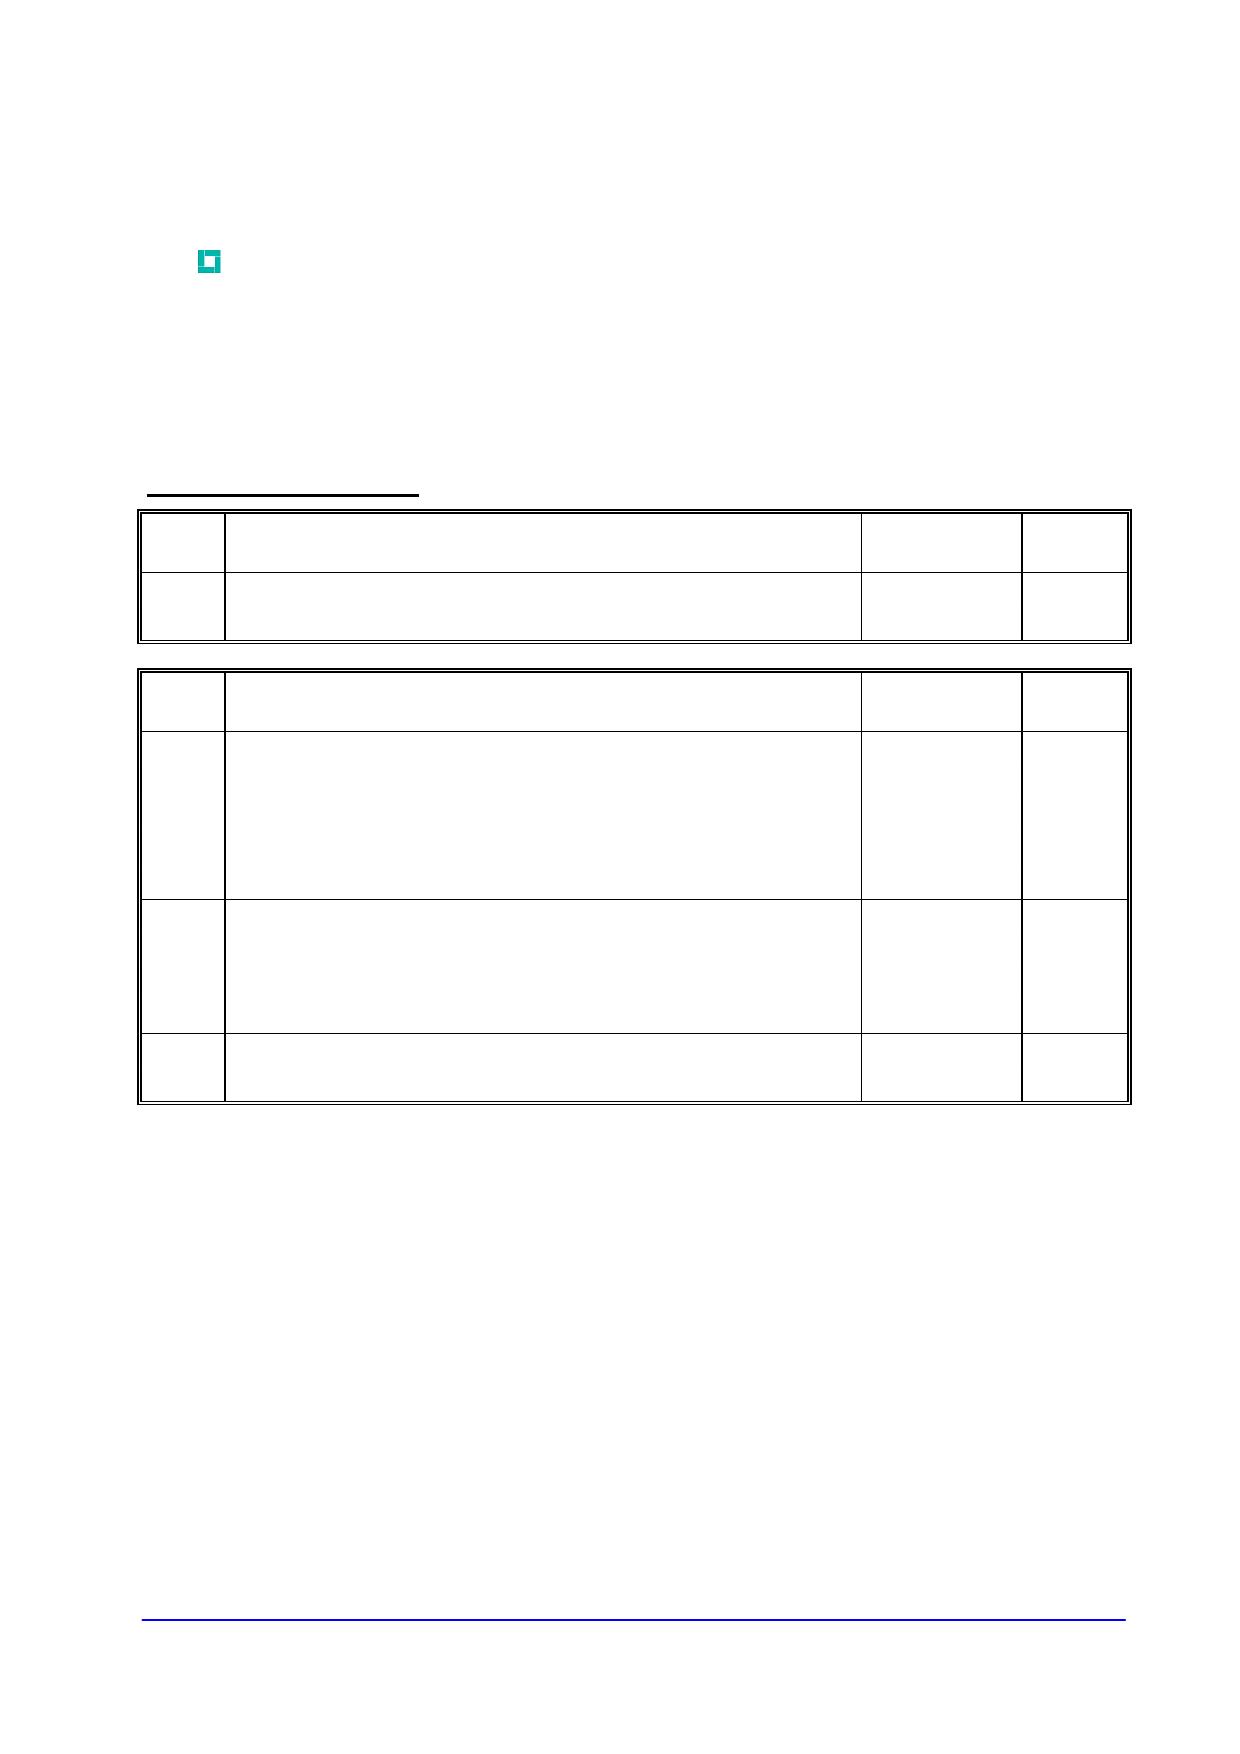 W4096ZV340 Datenblatt PDF